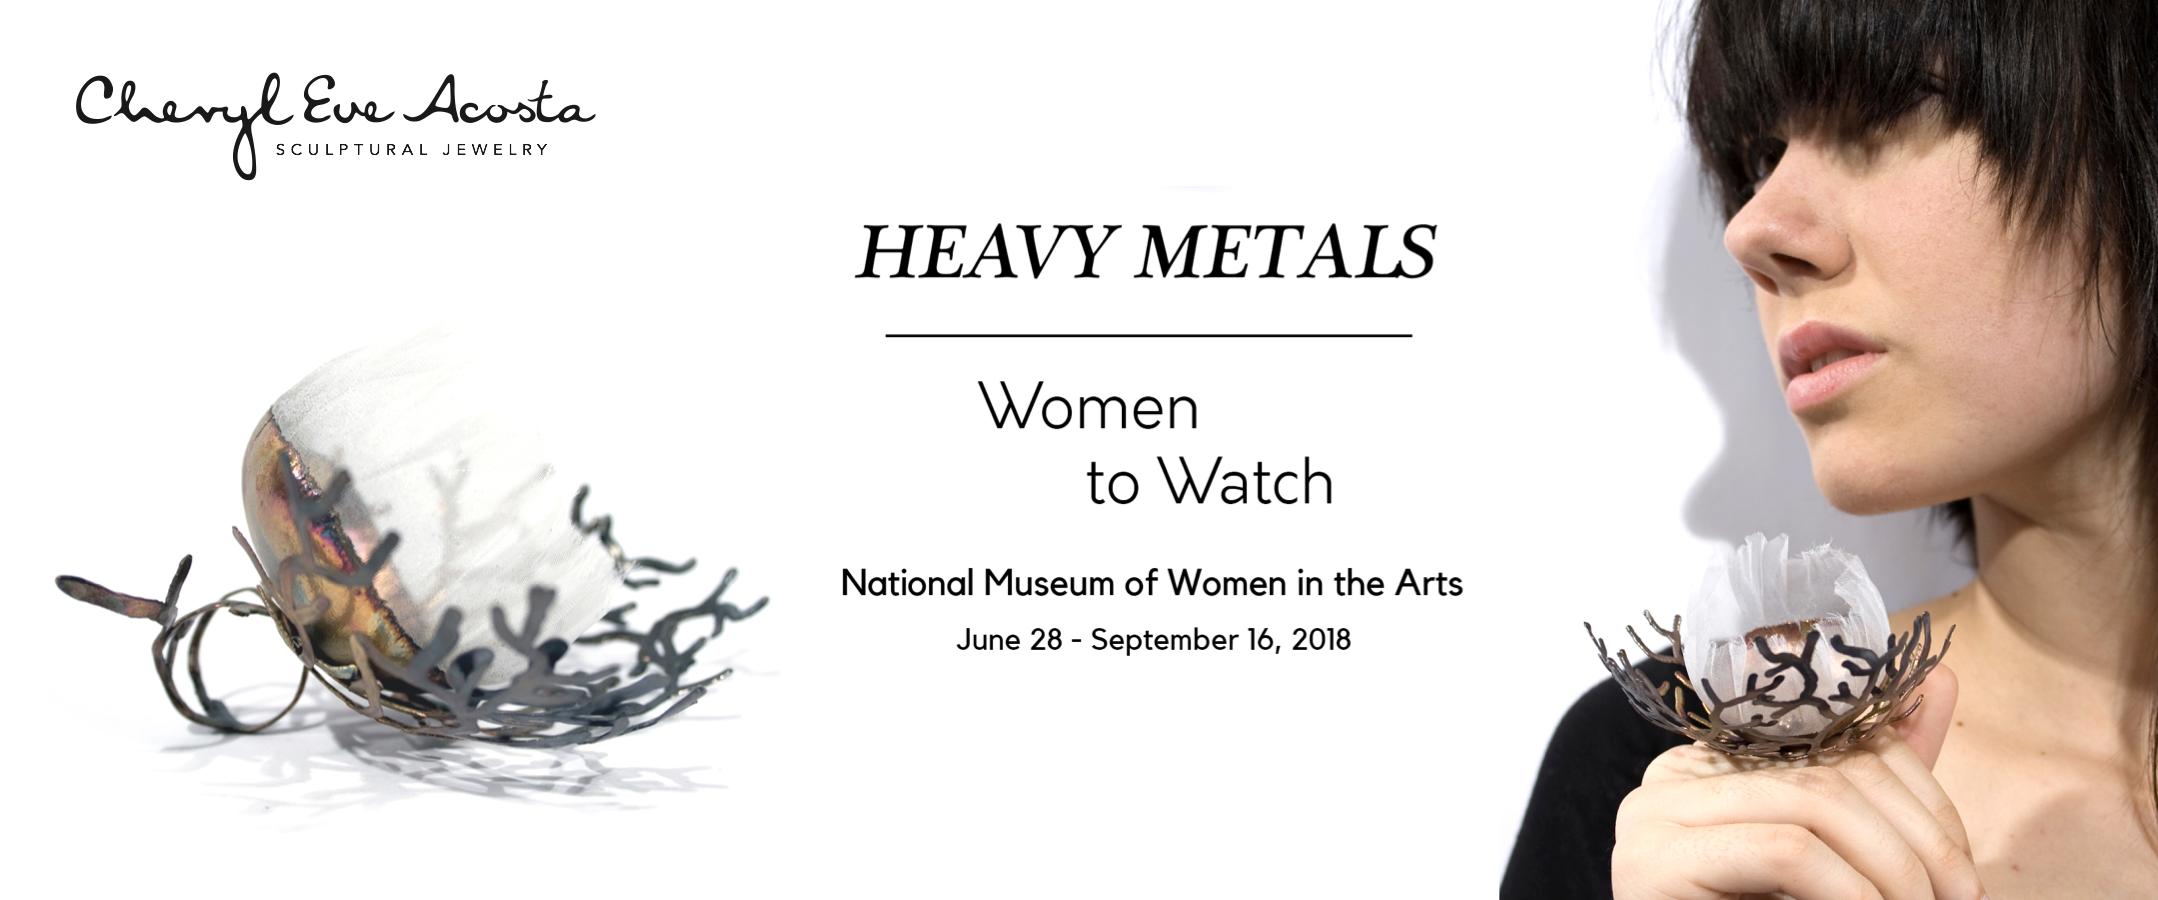 National MuseumWomenToWatchCherylEveacostaHeavyMetals..png